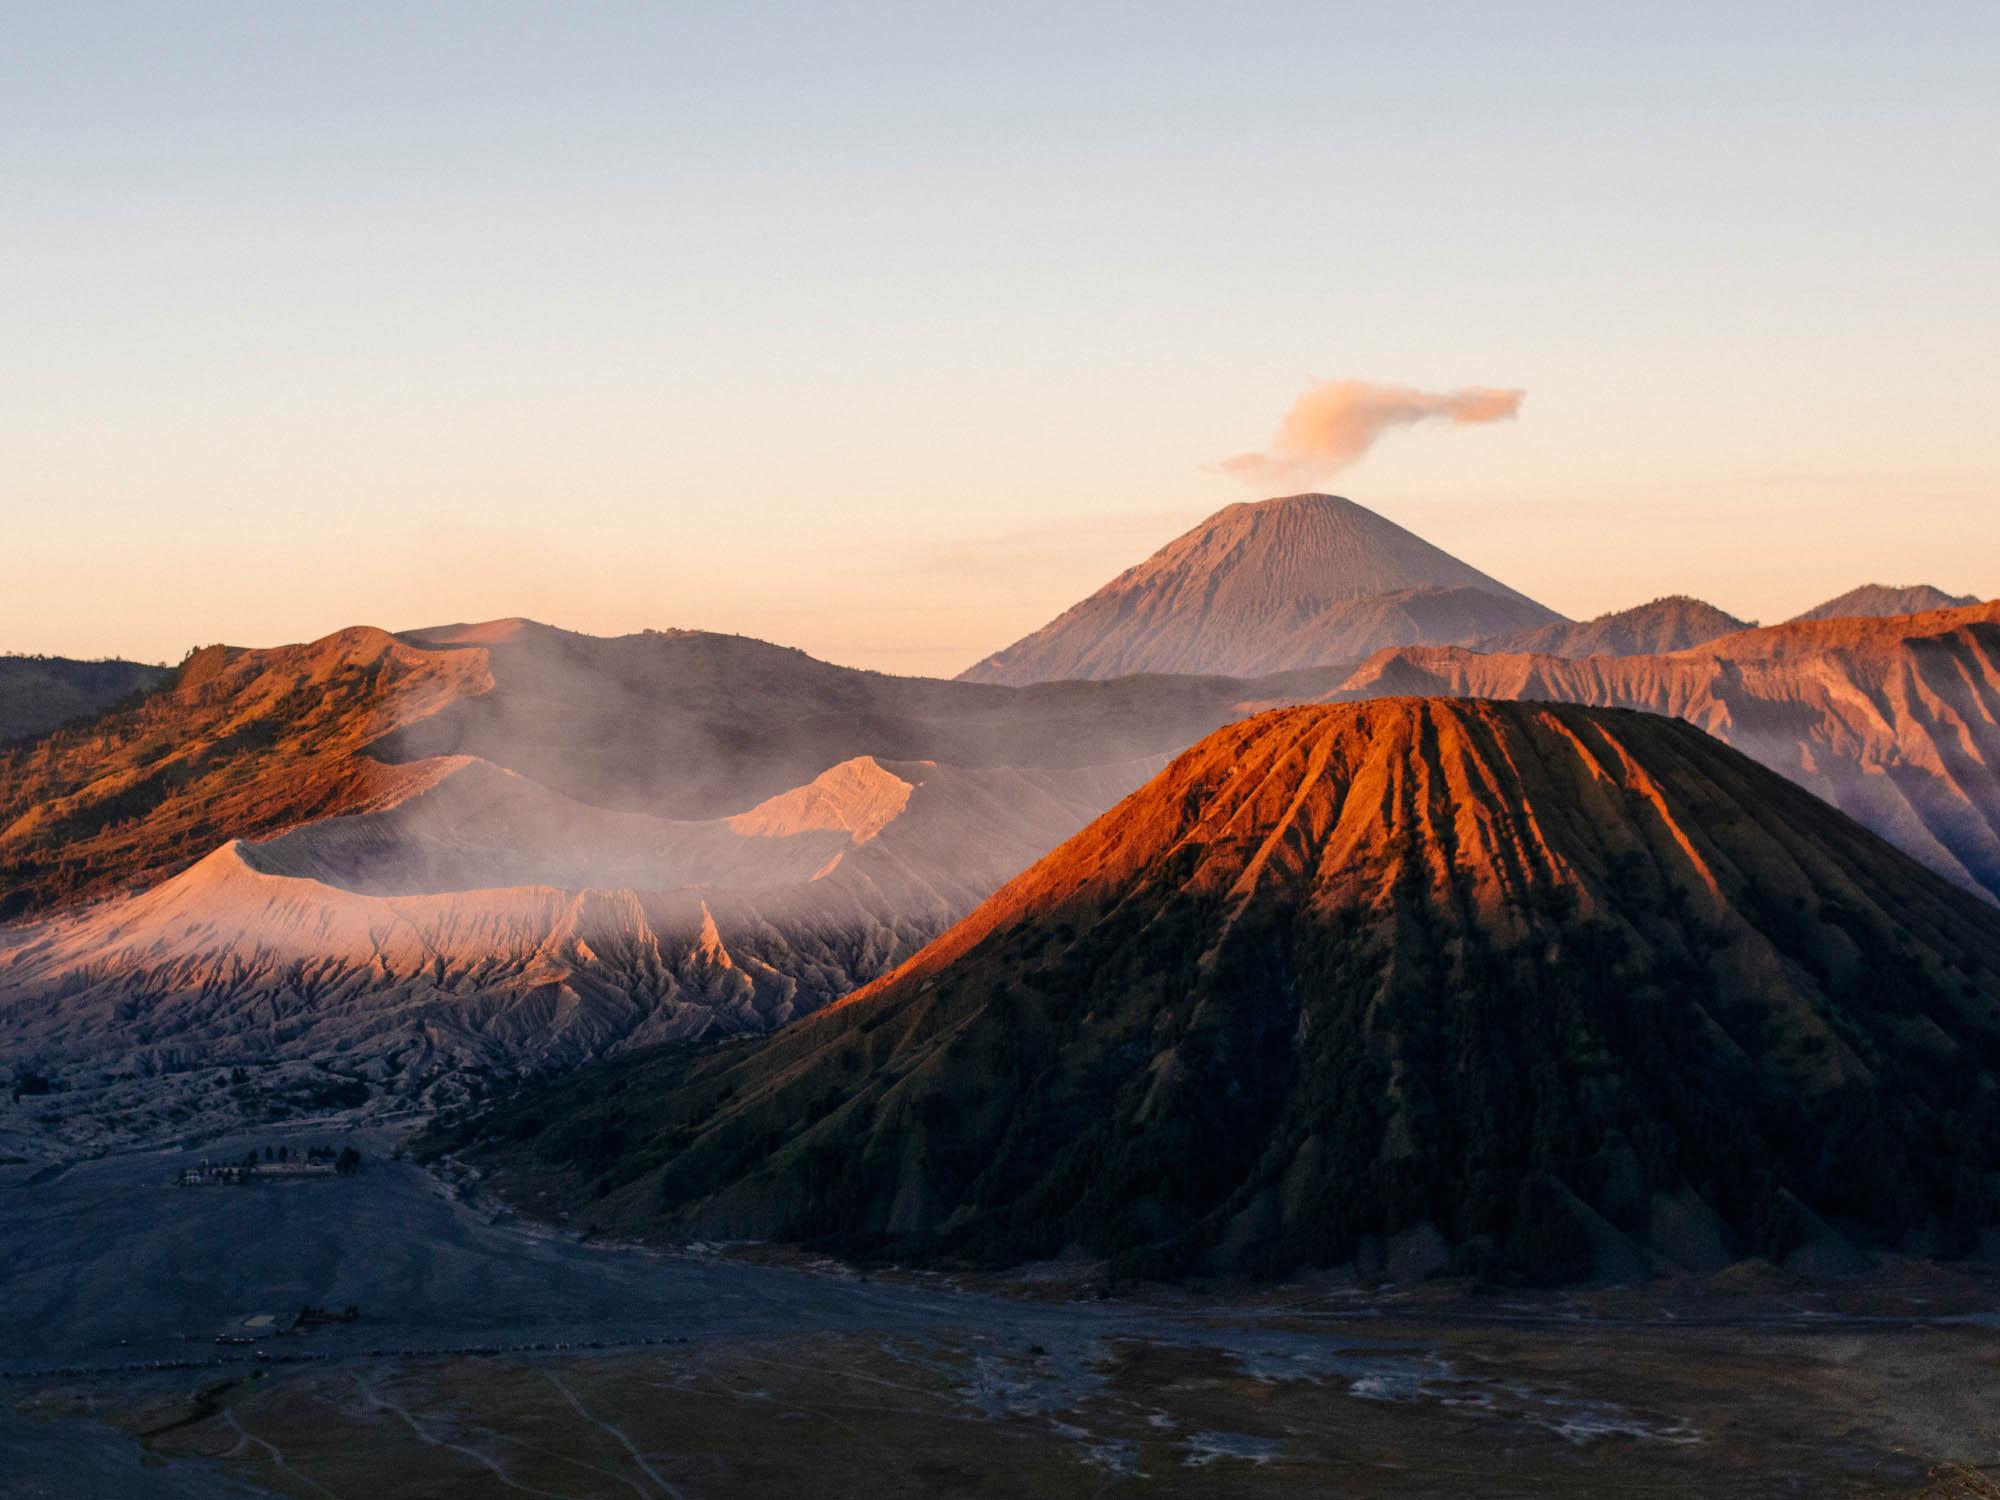 Sunrise over Mount Bromo.